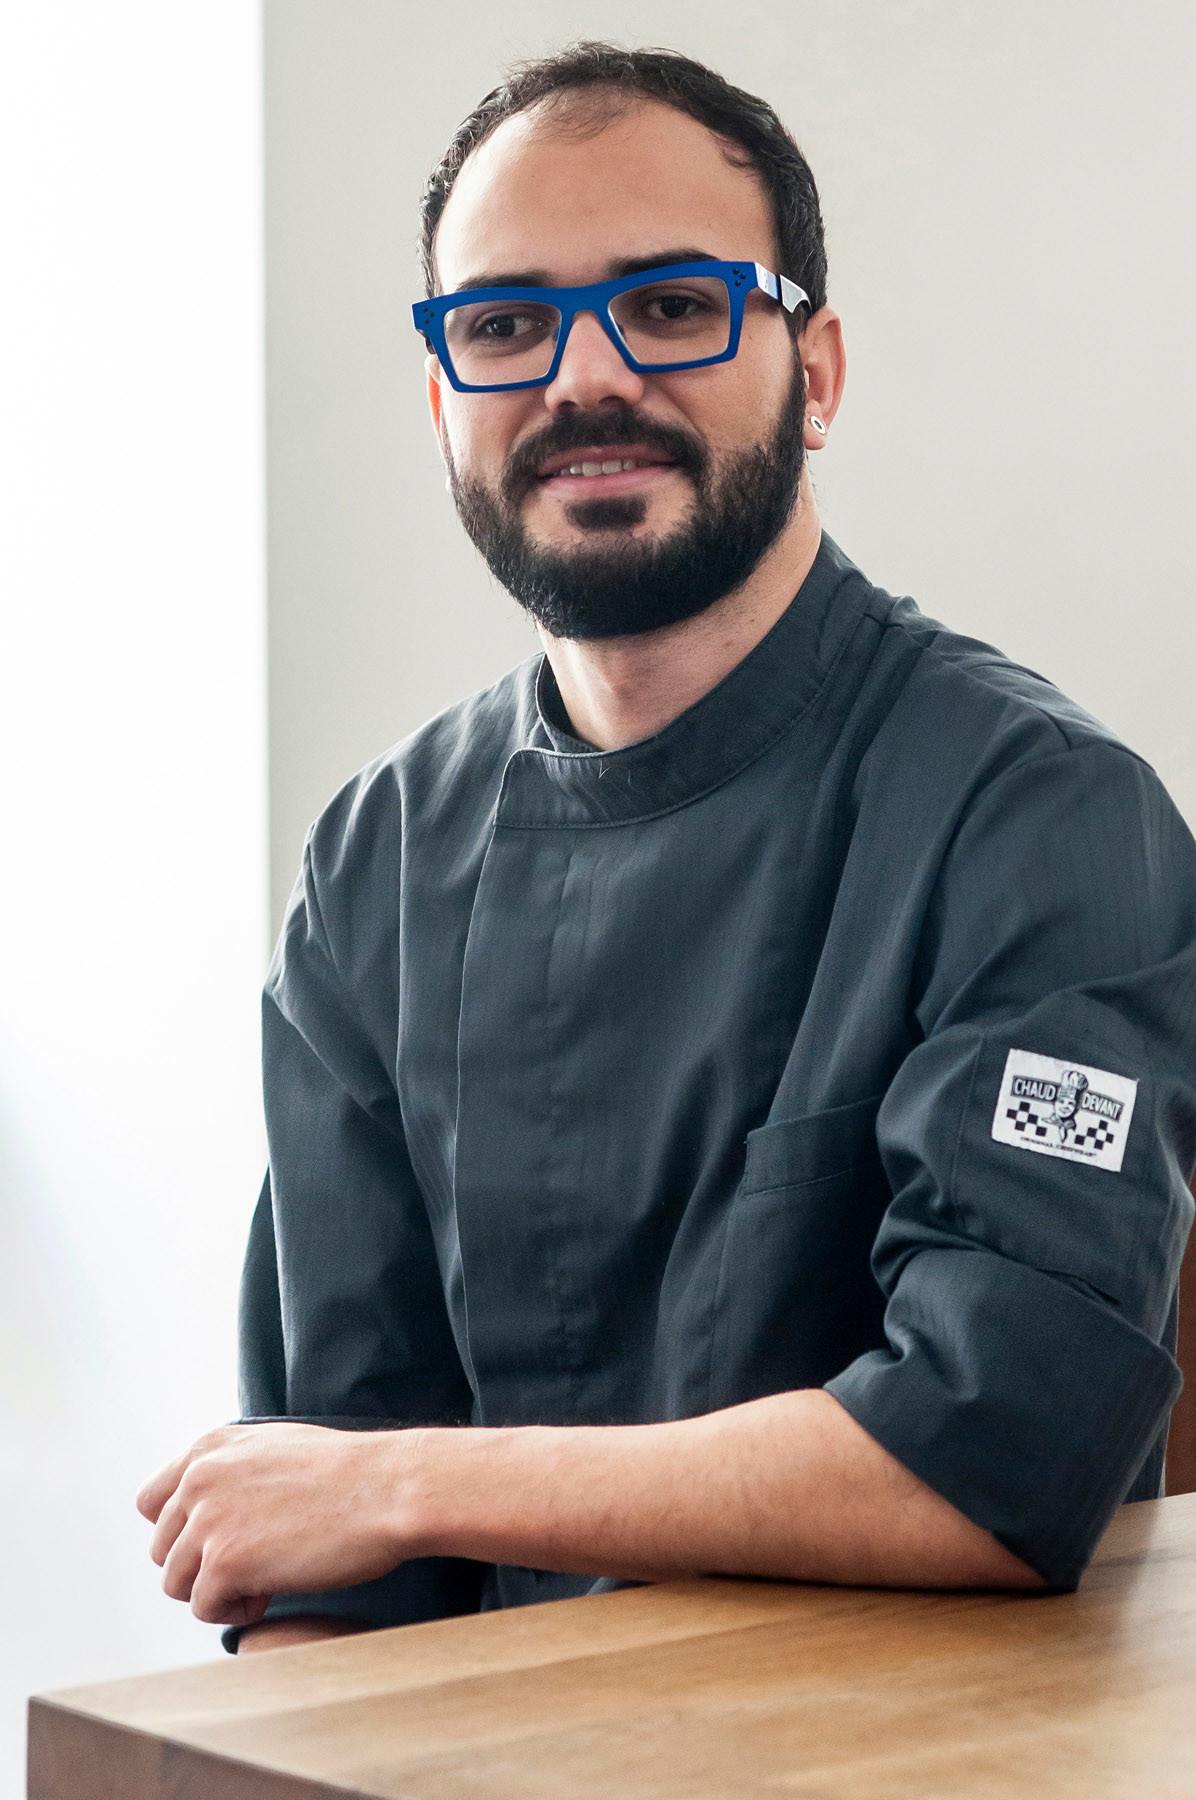 Andre Bicalho, az új séf